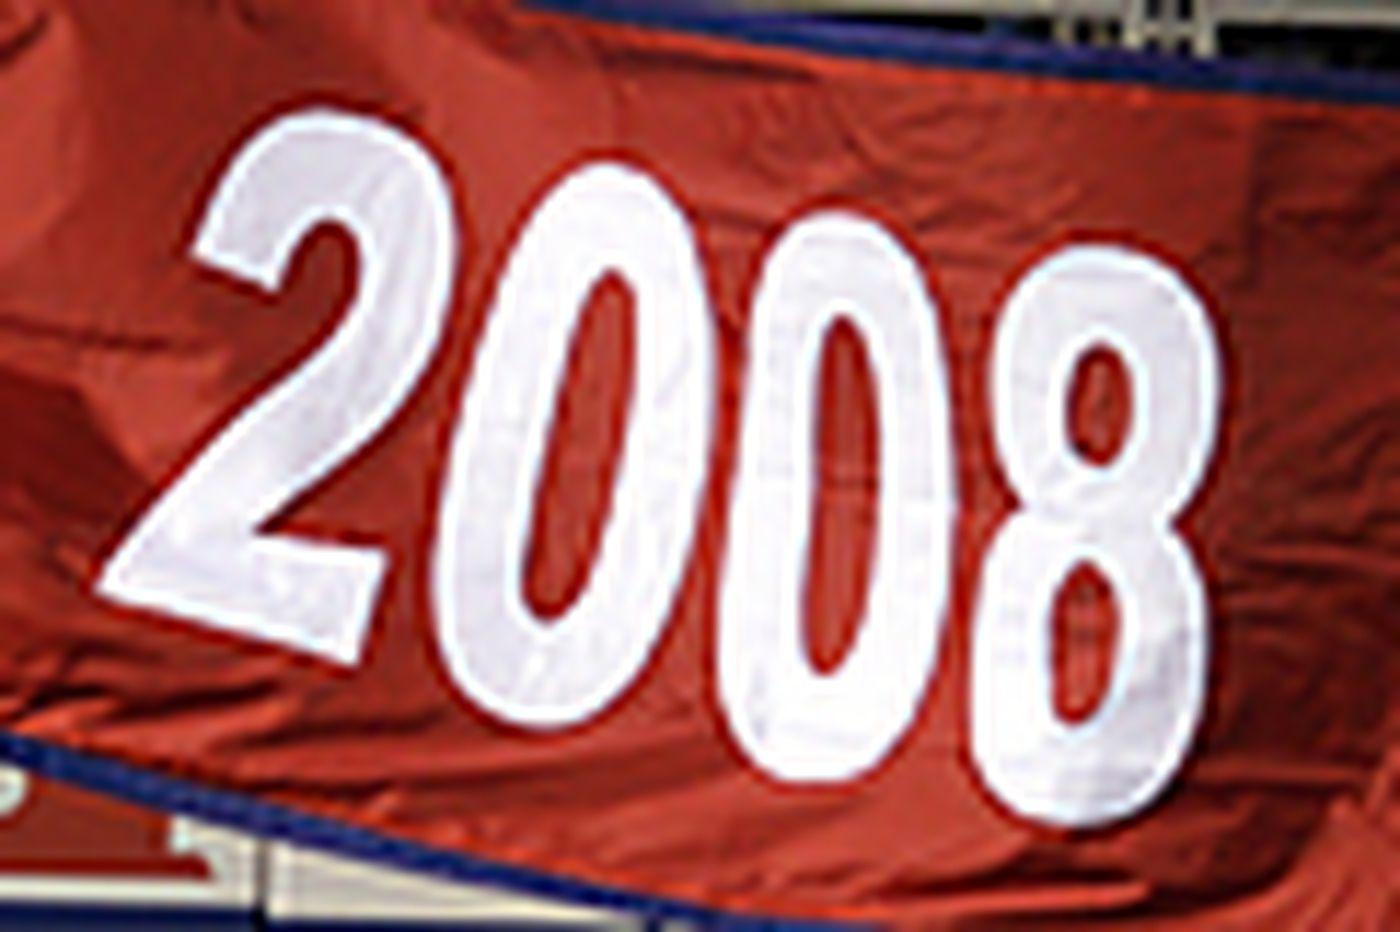 Phil Sheridan: Phillies provide a season of memorable moments